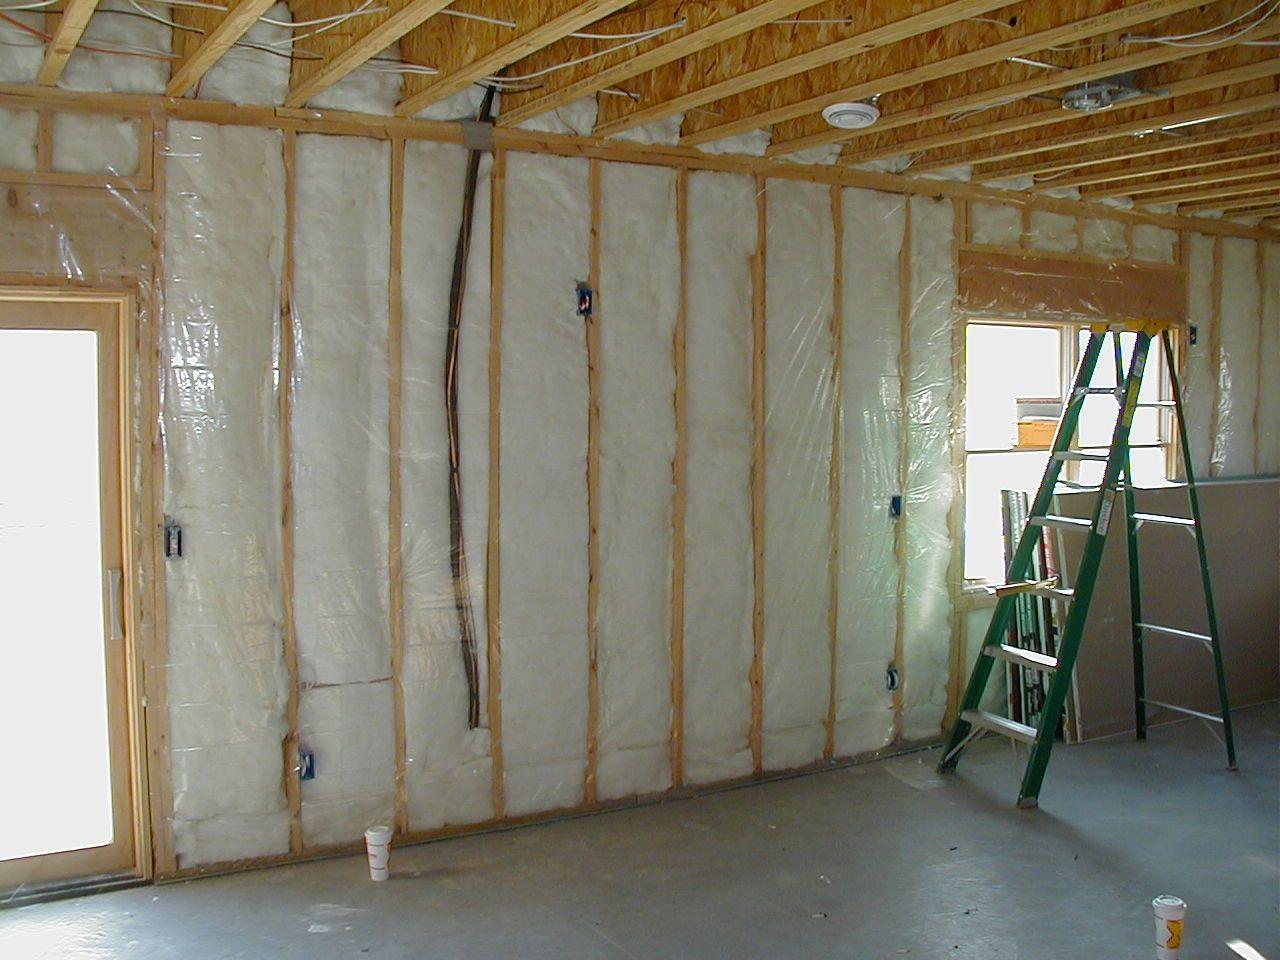 vapour barrier for basement walls http dreamtree us pinterest rh pinterest com basement vapor barrier yes or no basement moisture barrier home depot